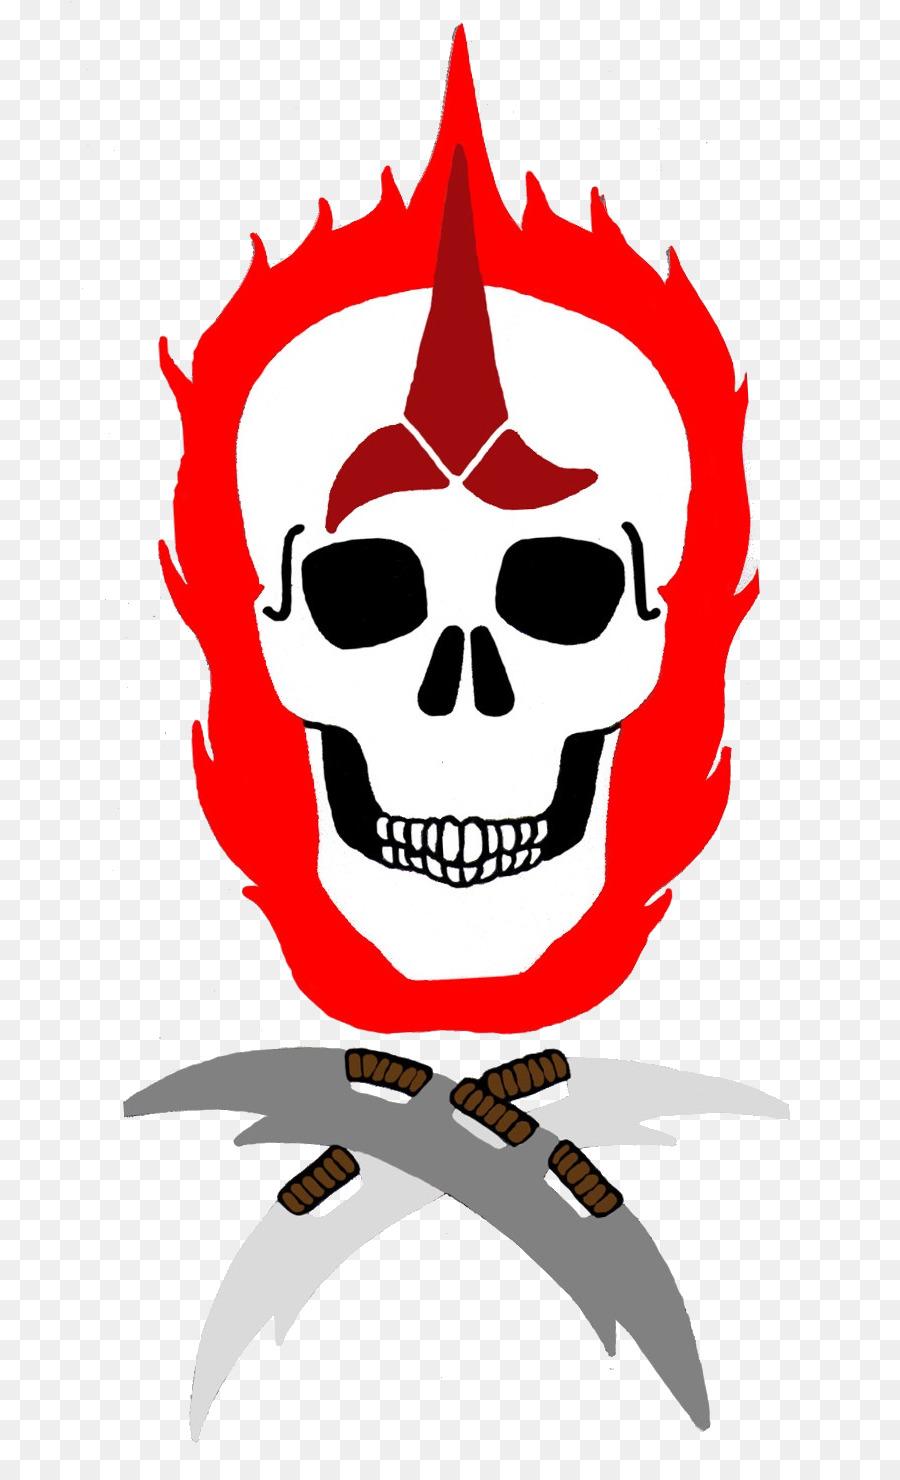 Skull Character Fiction Clip Art Skull Png Download 8161465